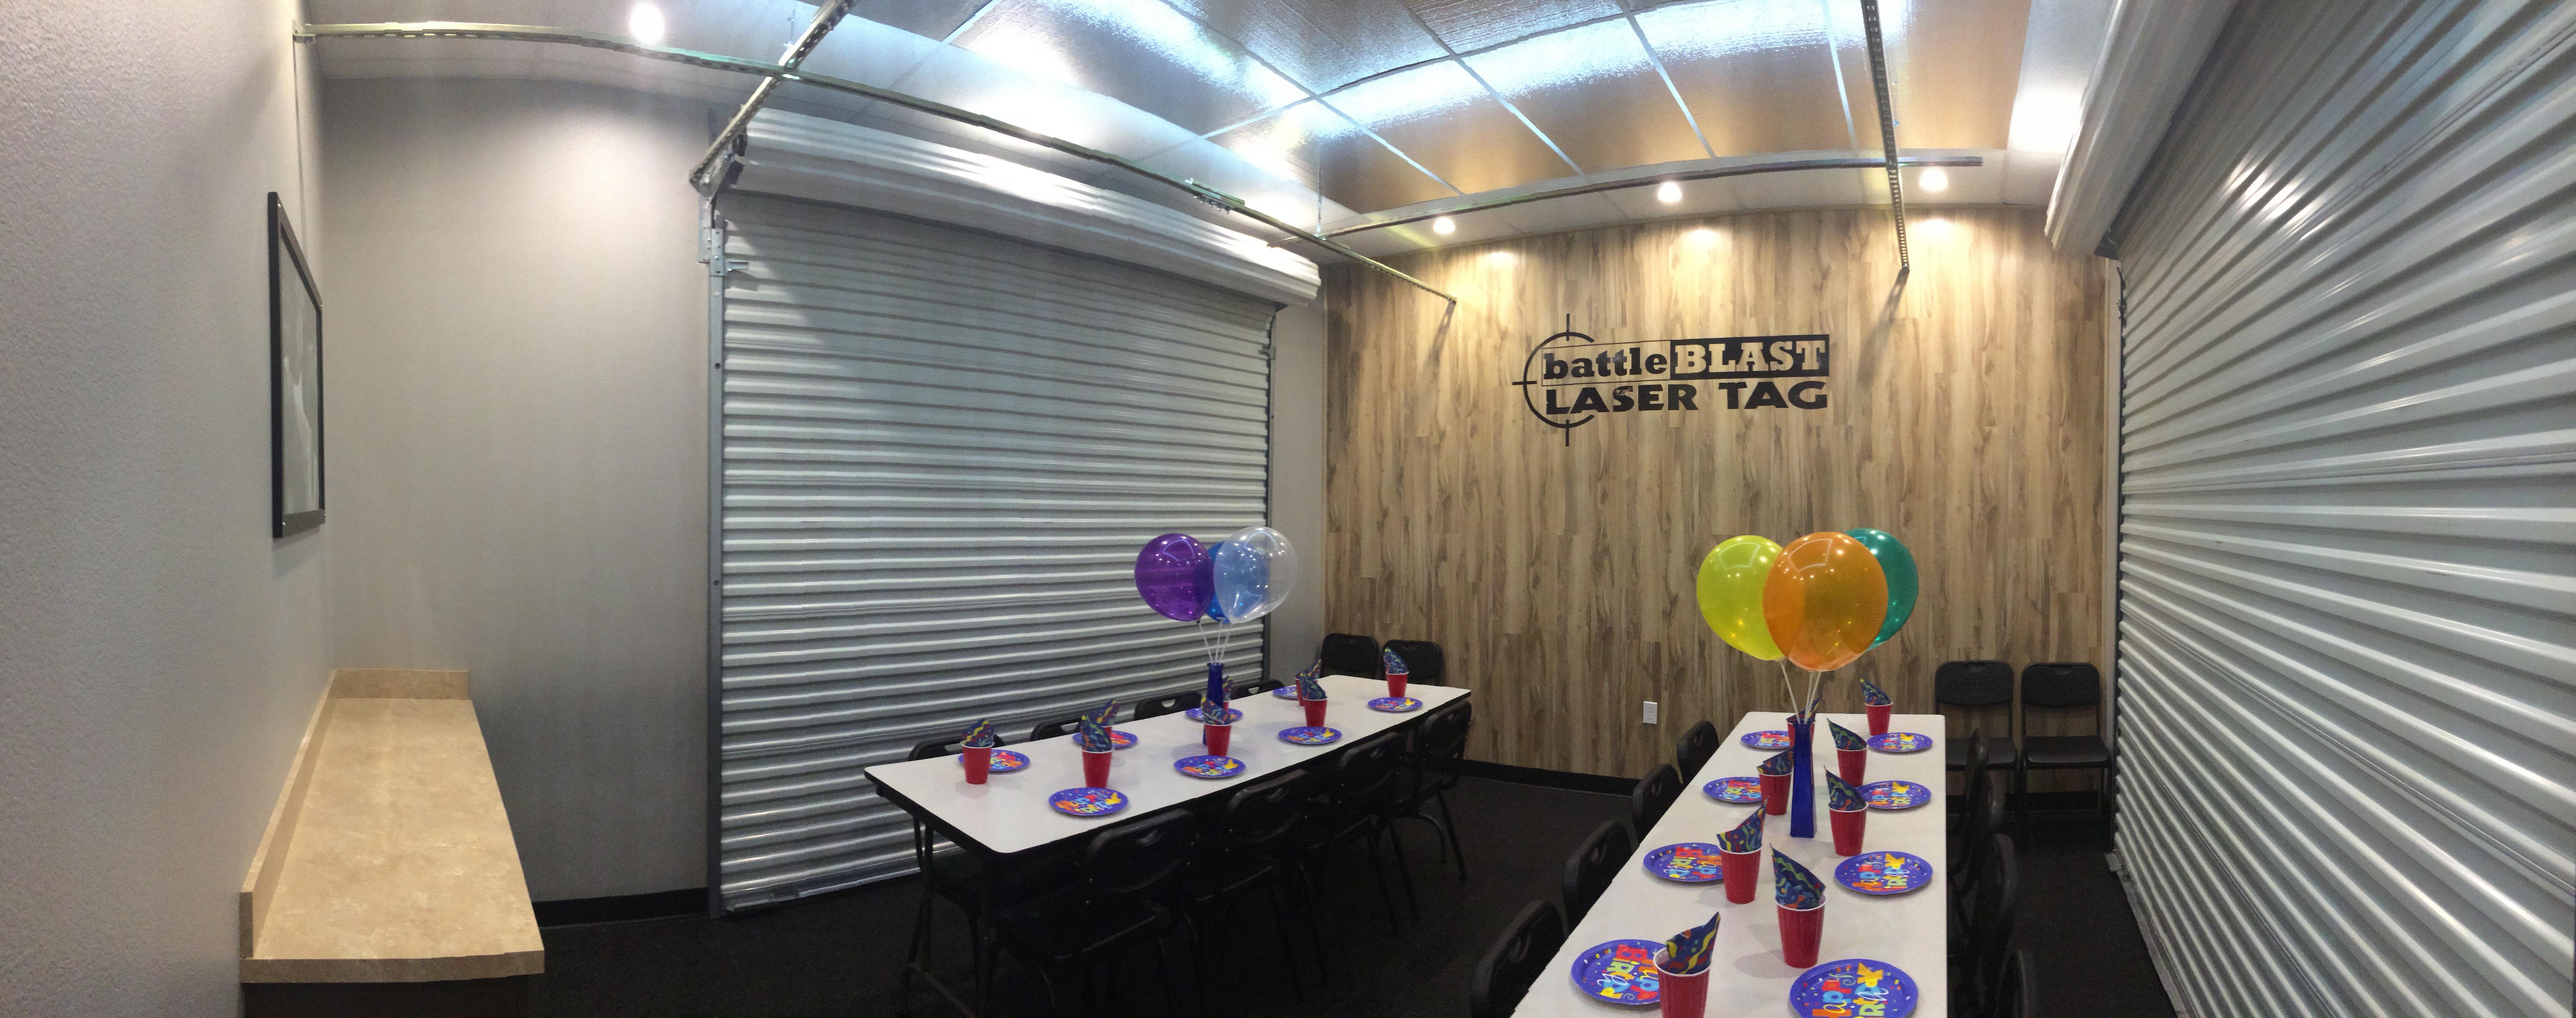 BattleBLAST Birthday Parties Las Vegas